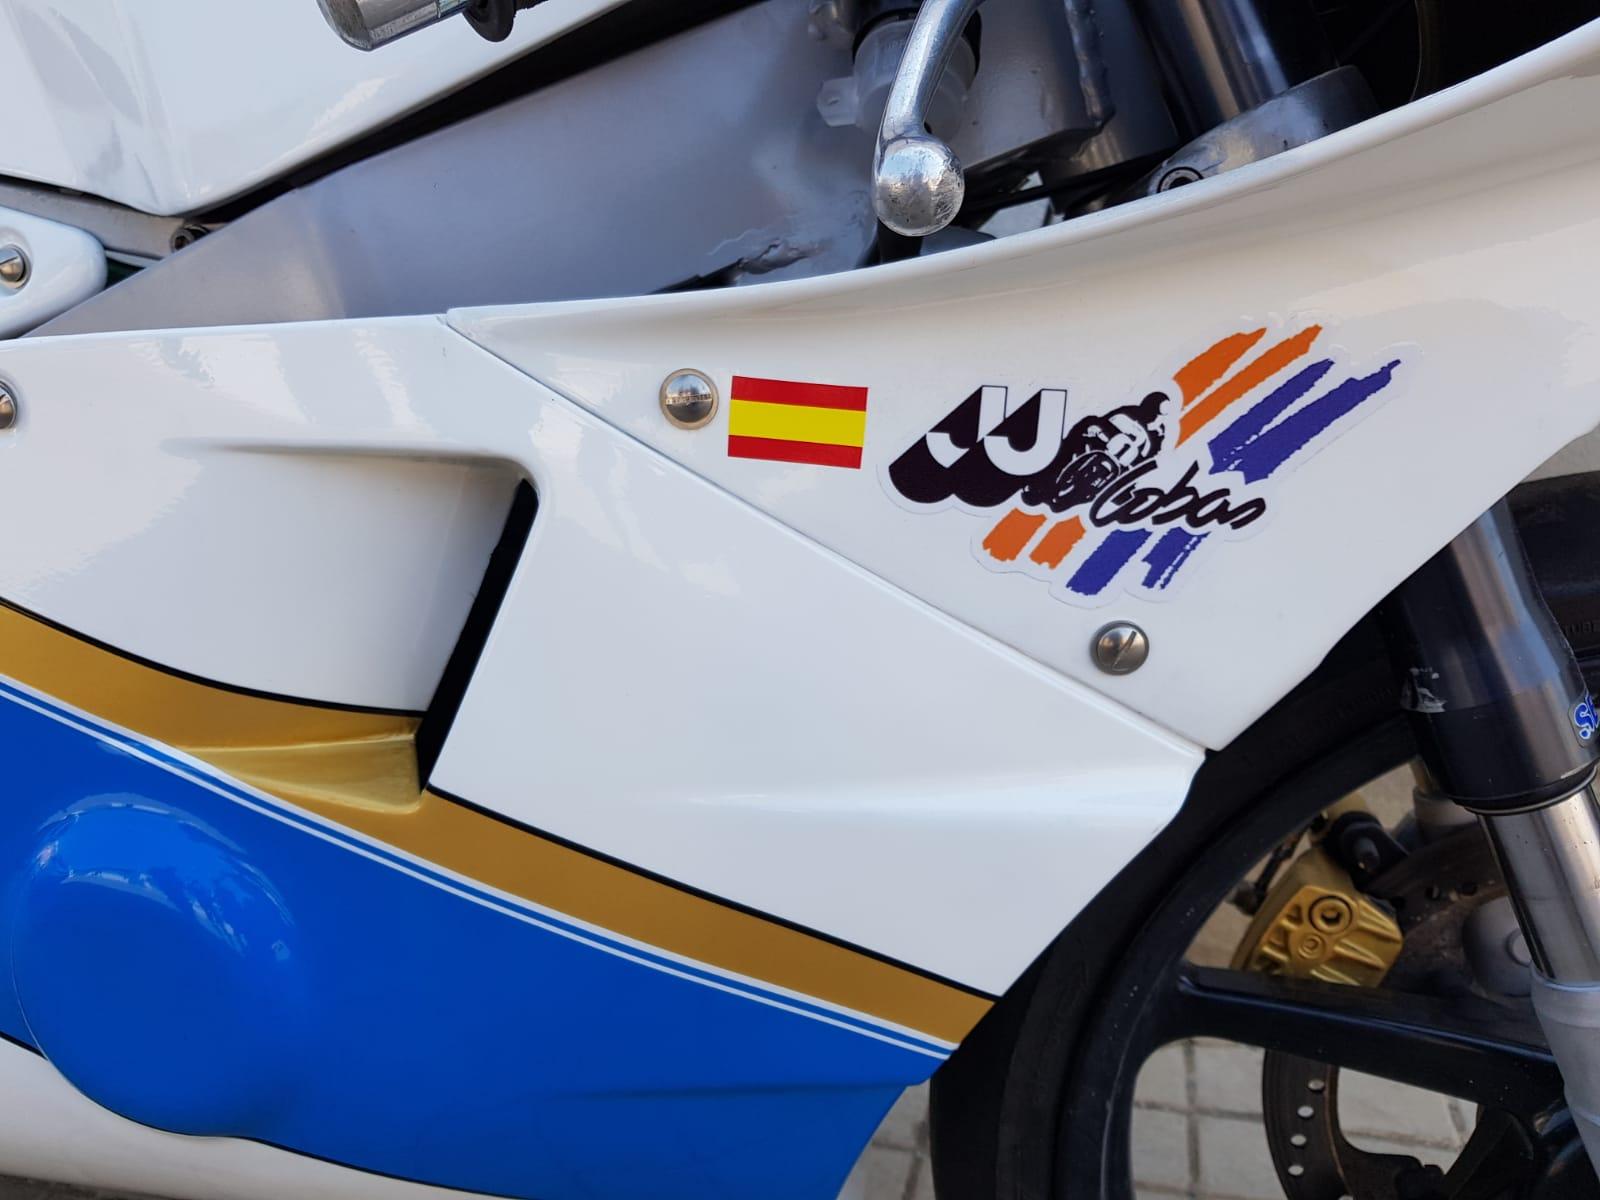 MH 003 JJ.COBAS Moto Hernan 15y4bd